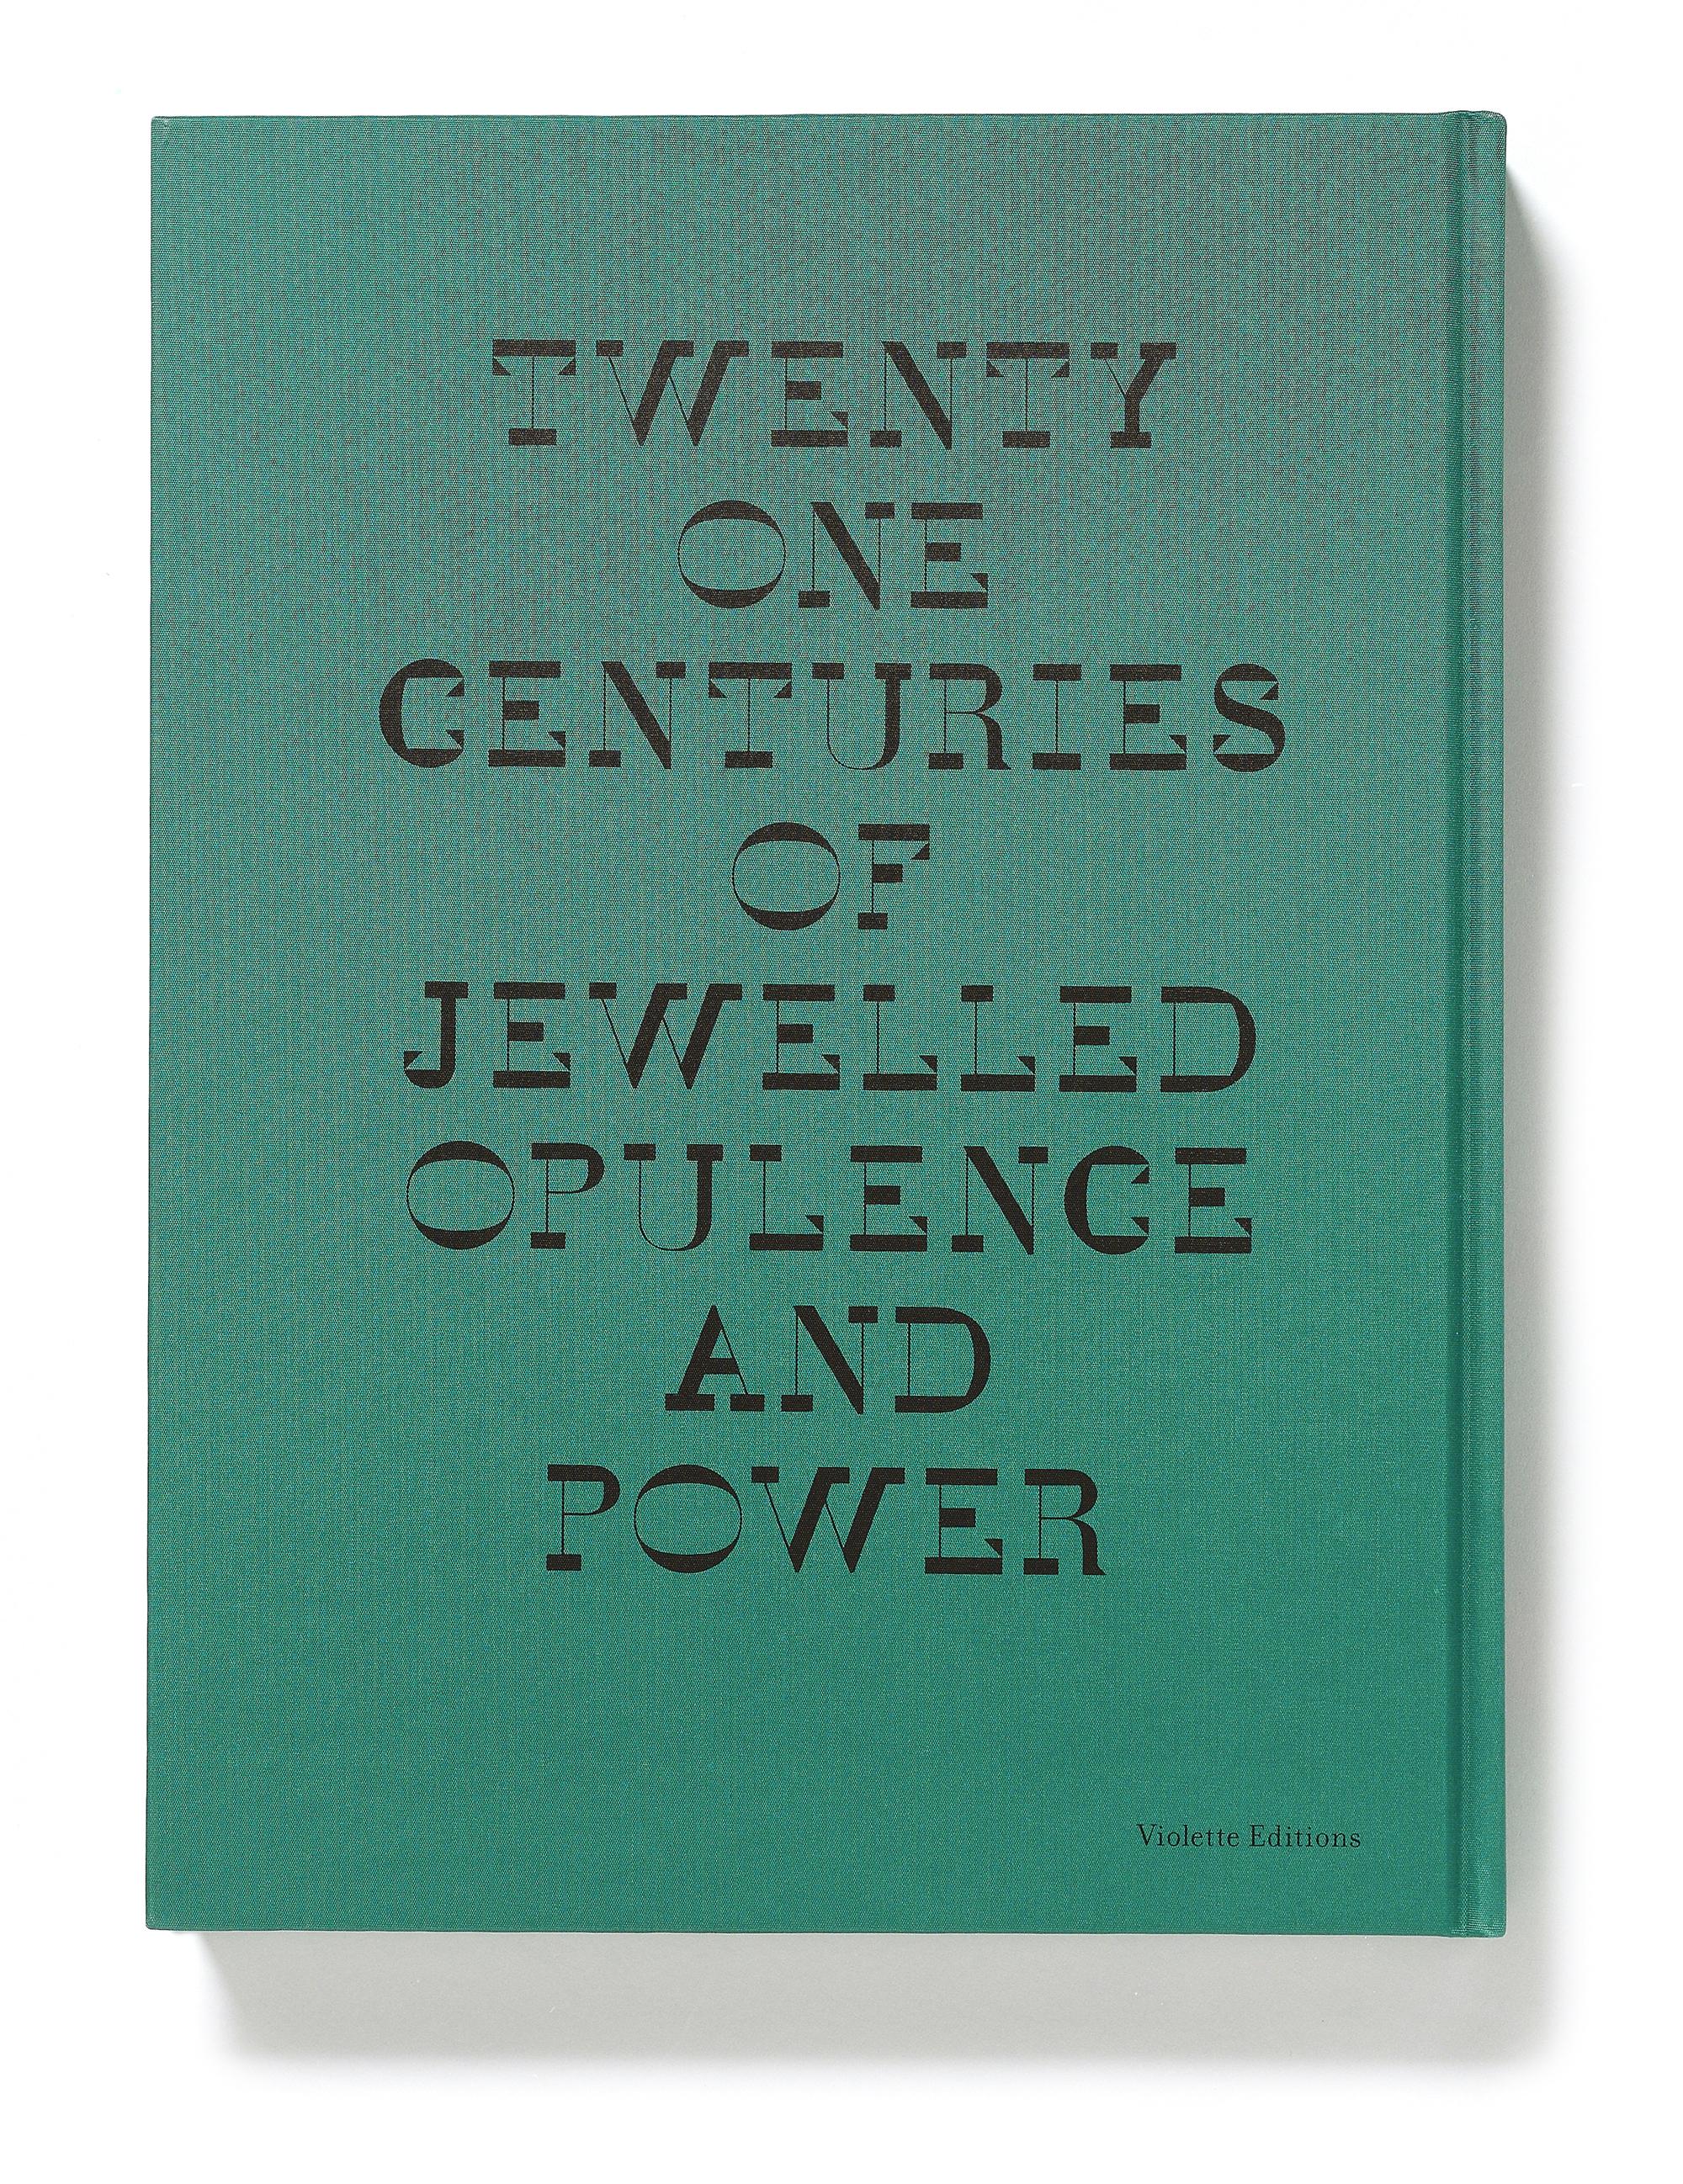 Emerald_Violette Editions_5.jpg